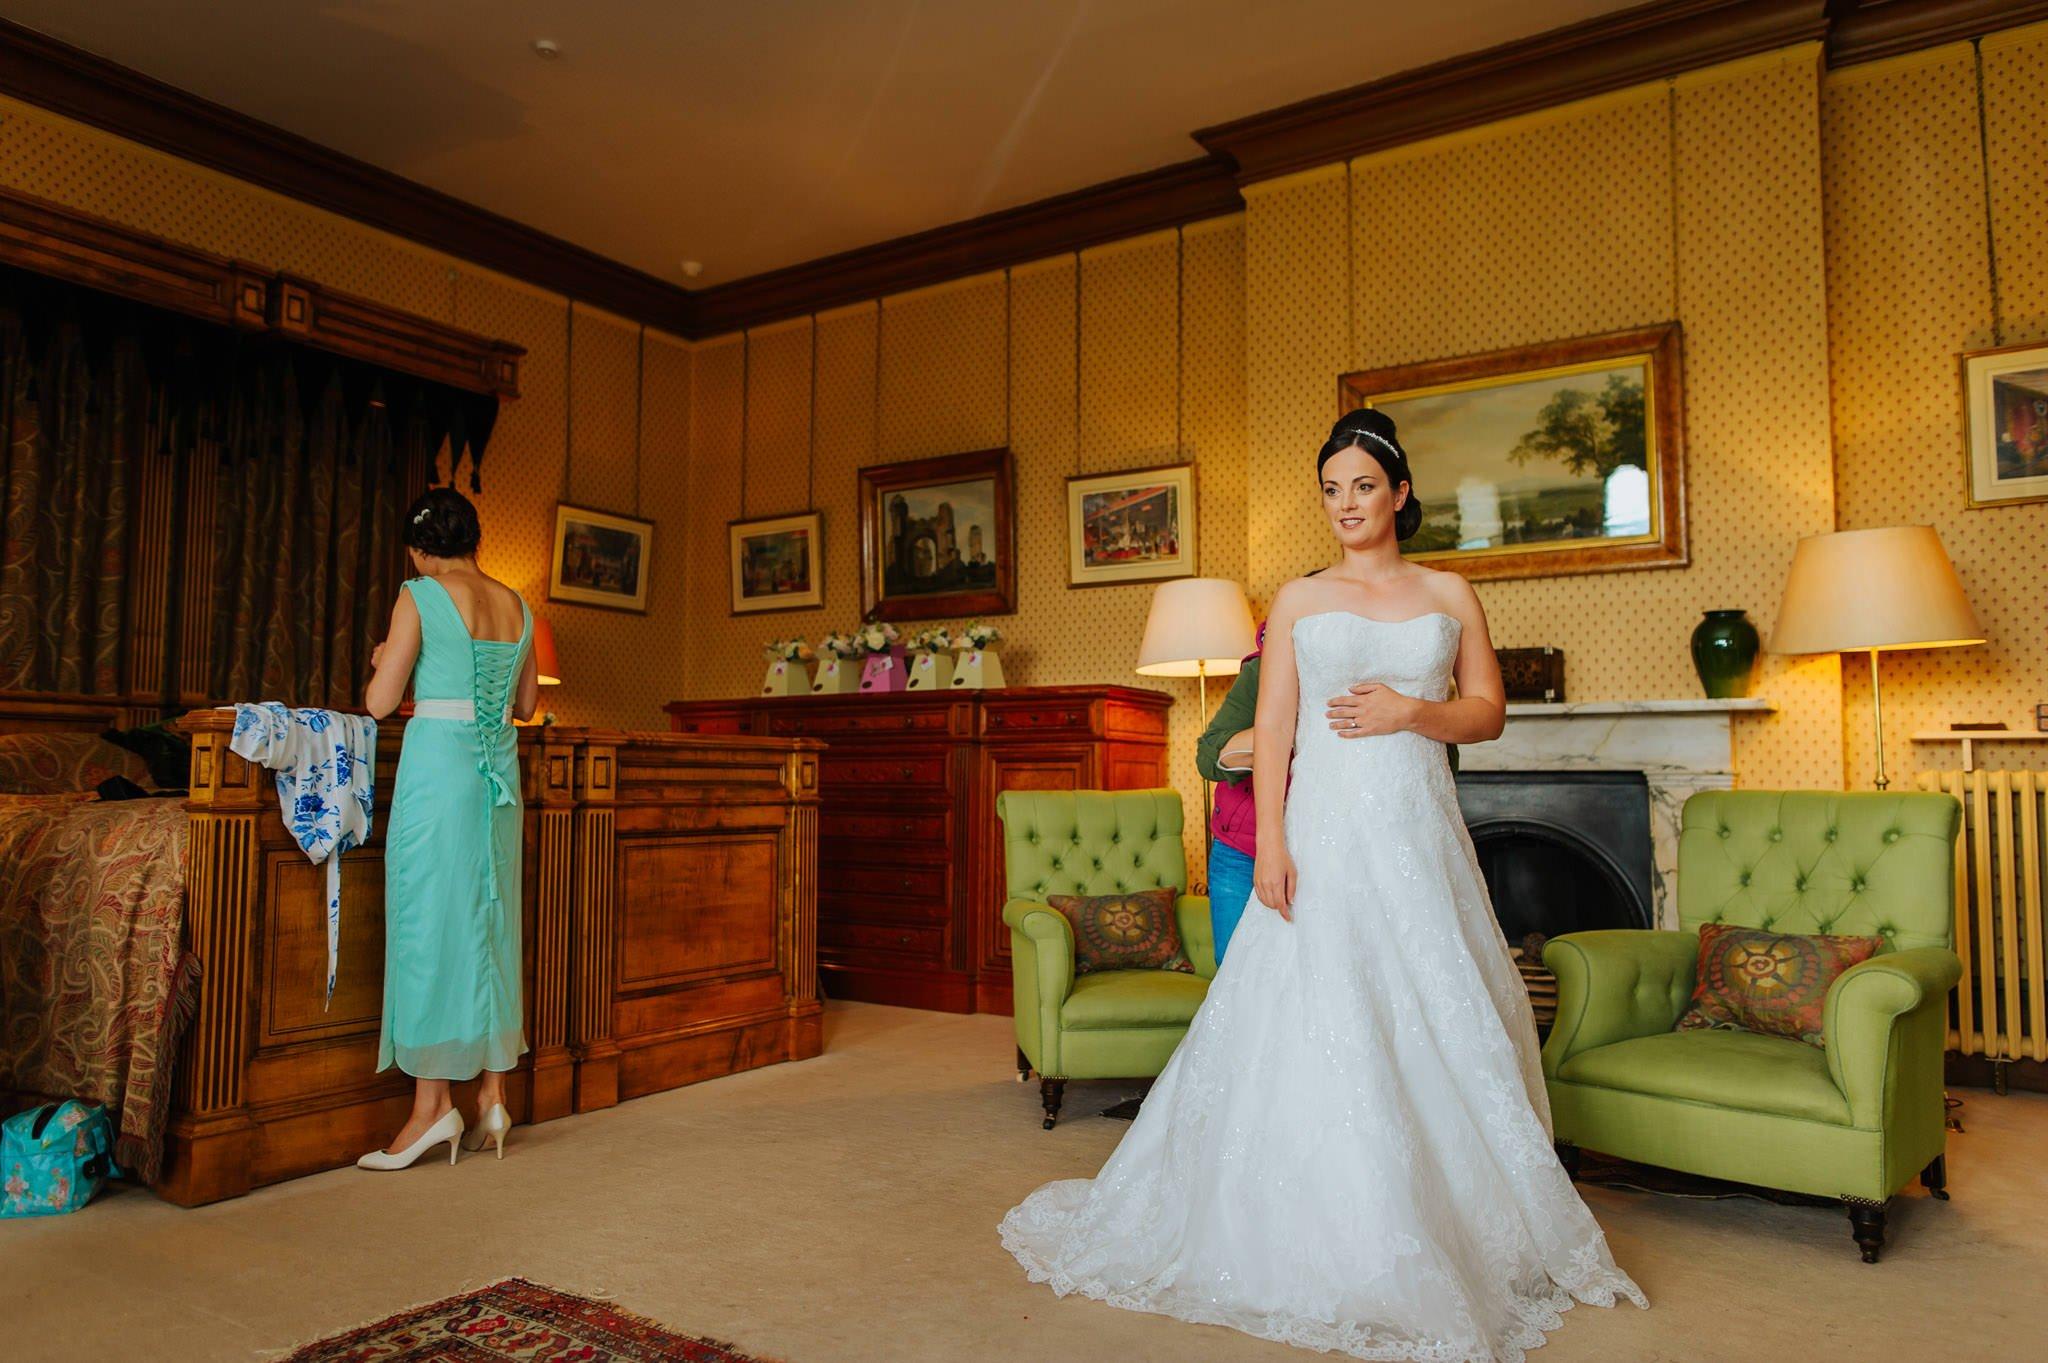 Eastnor Castle wedding photographer Herefordshire, West Midlands - Sarah + Dean 12